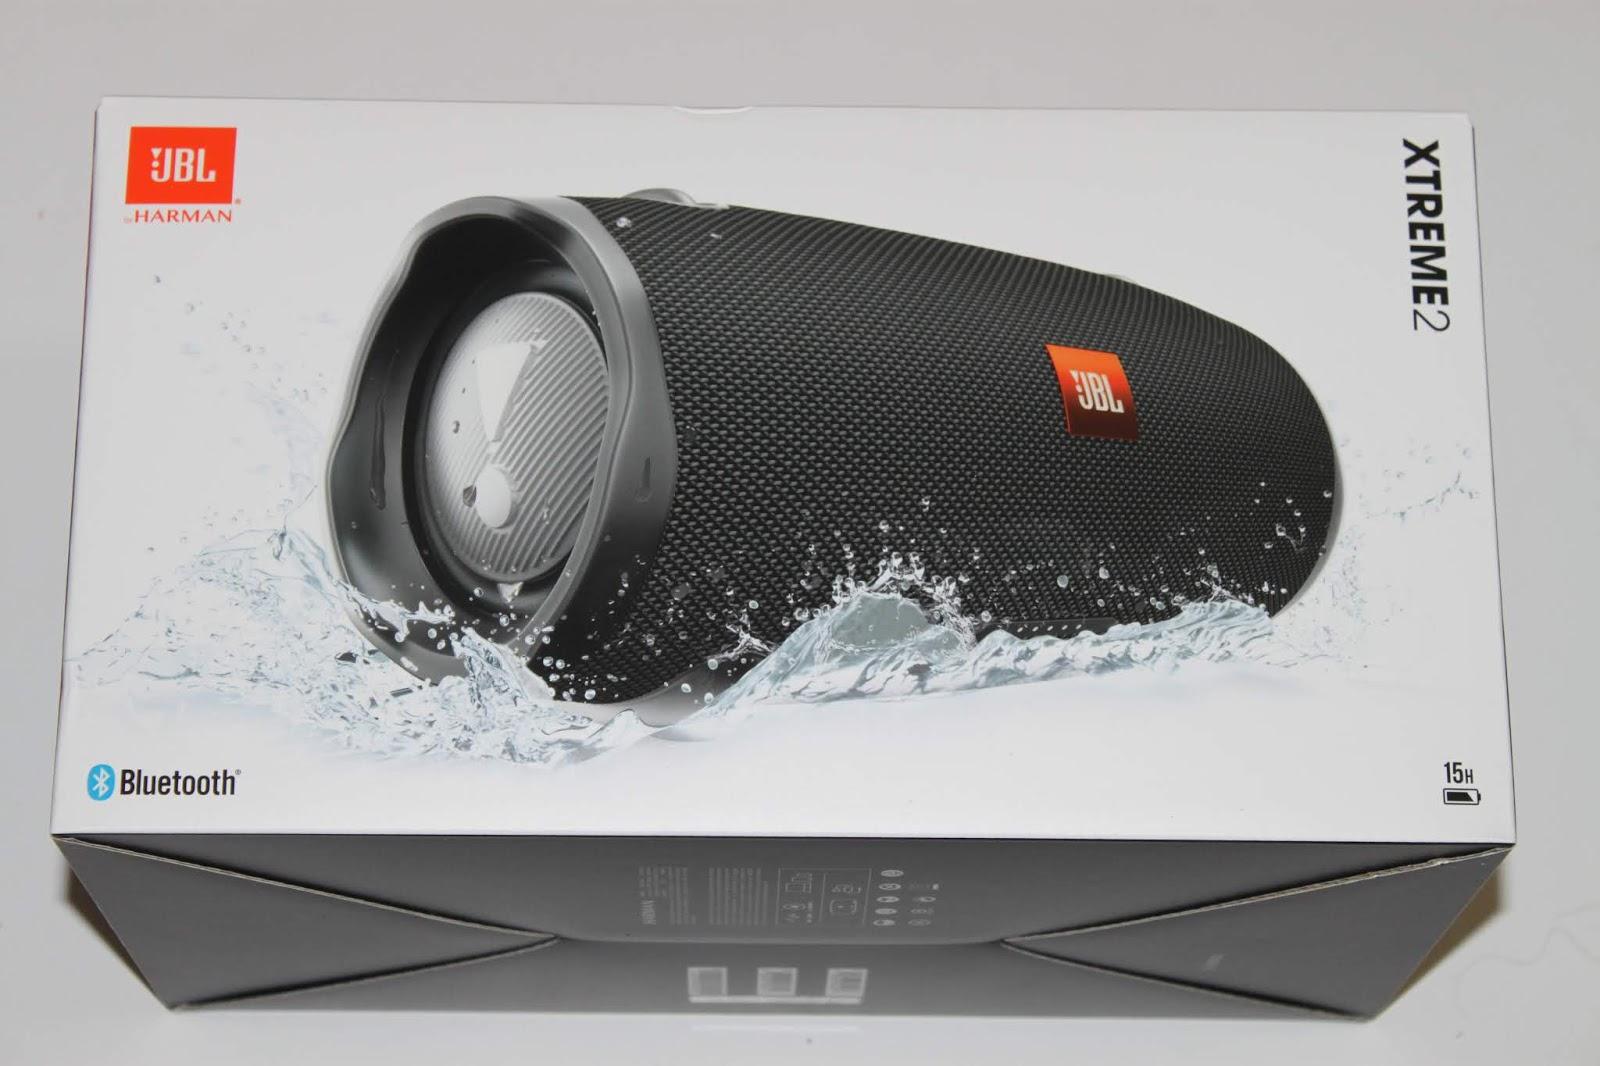 Stereowise Plus: JBL Extreme 2 Wireless Waterproof Speaker